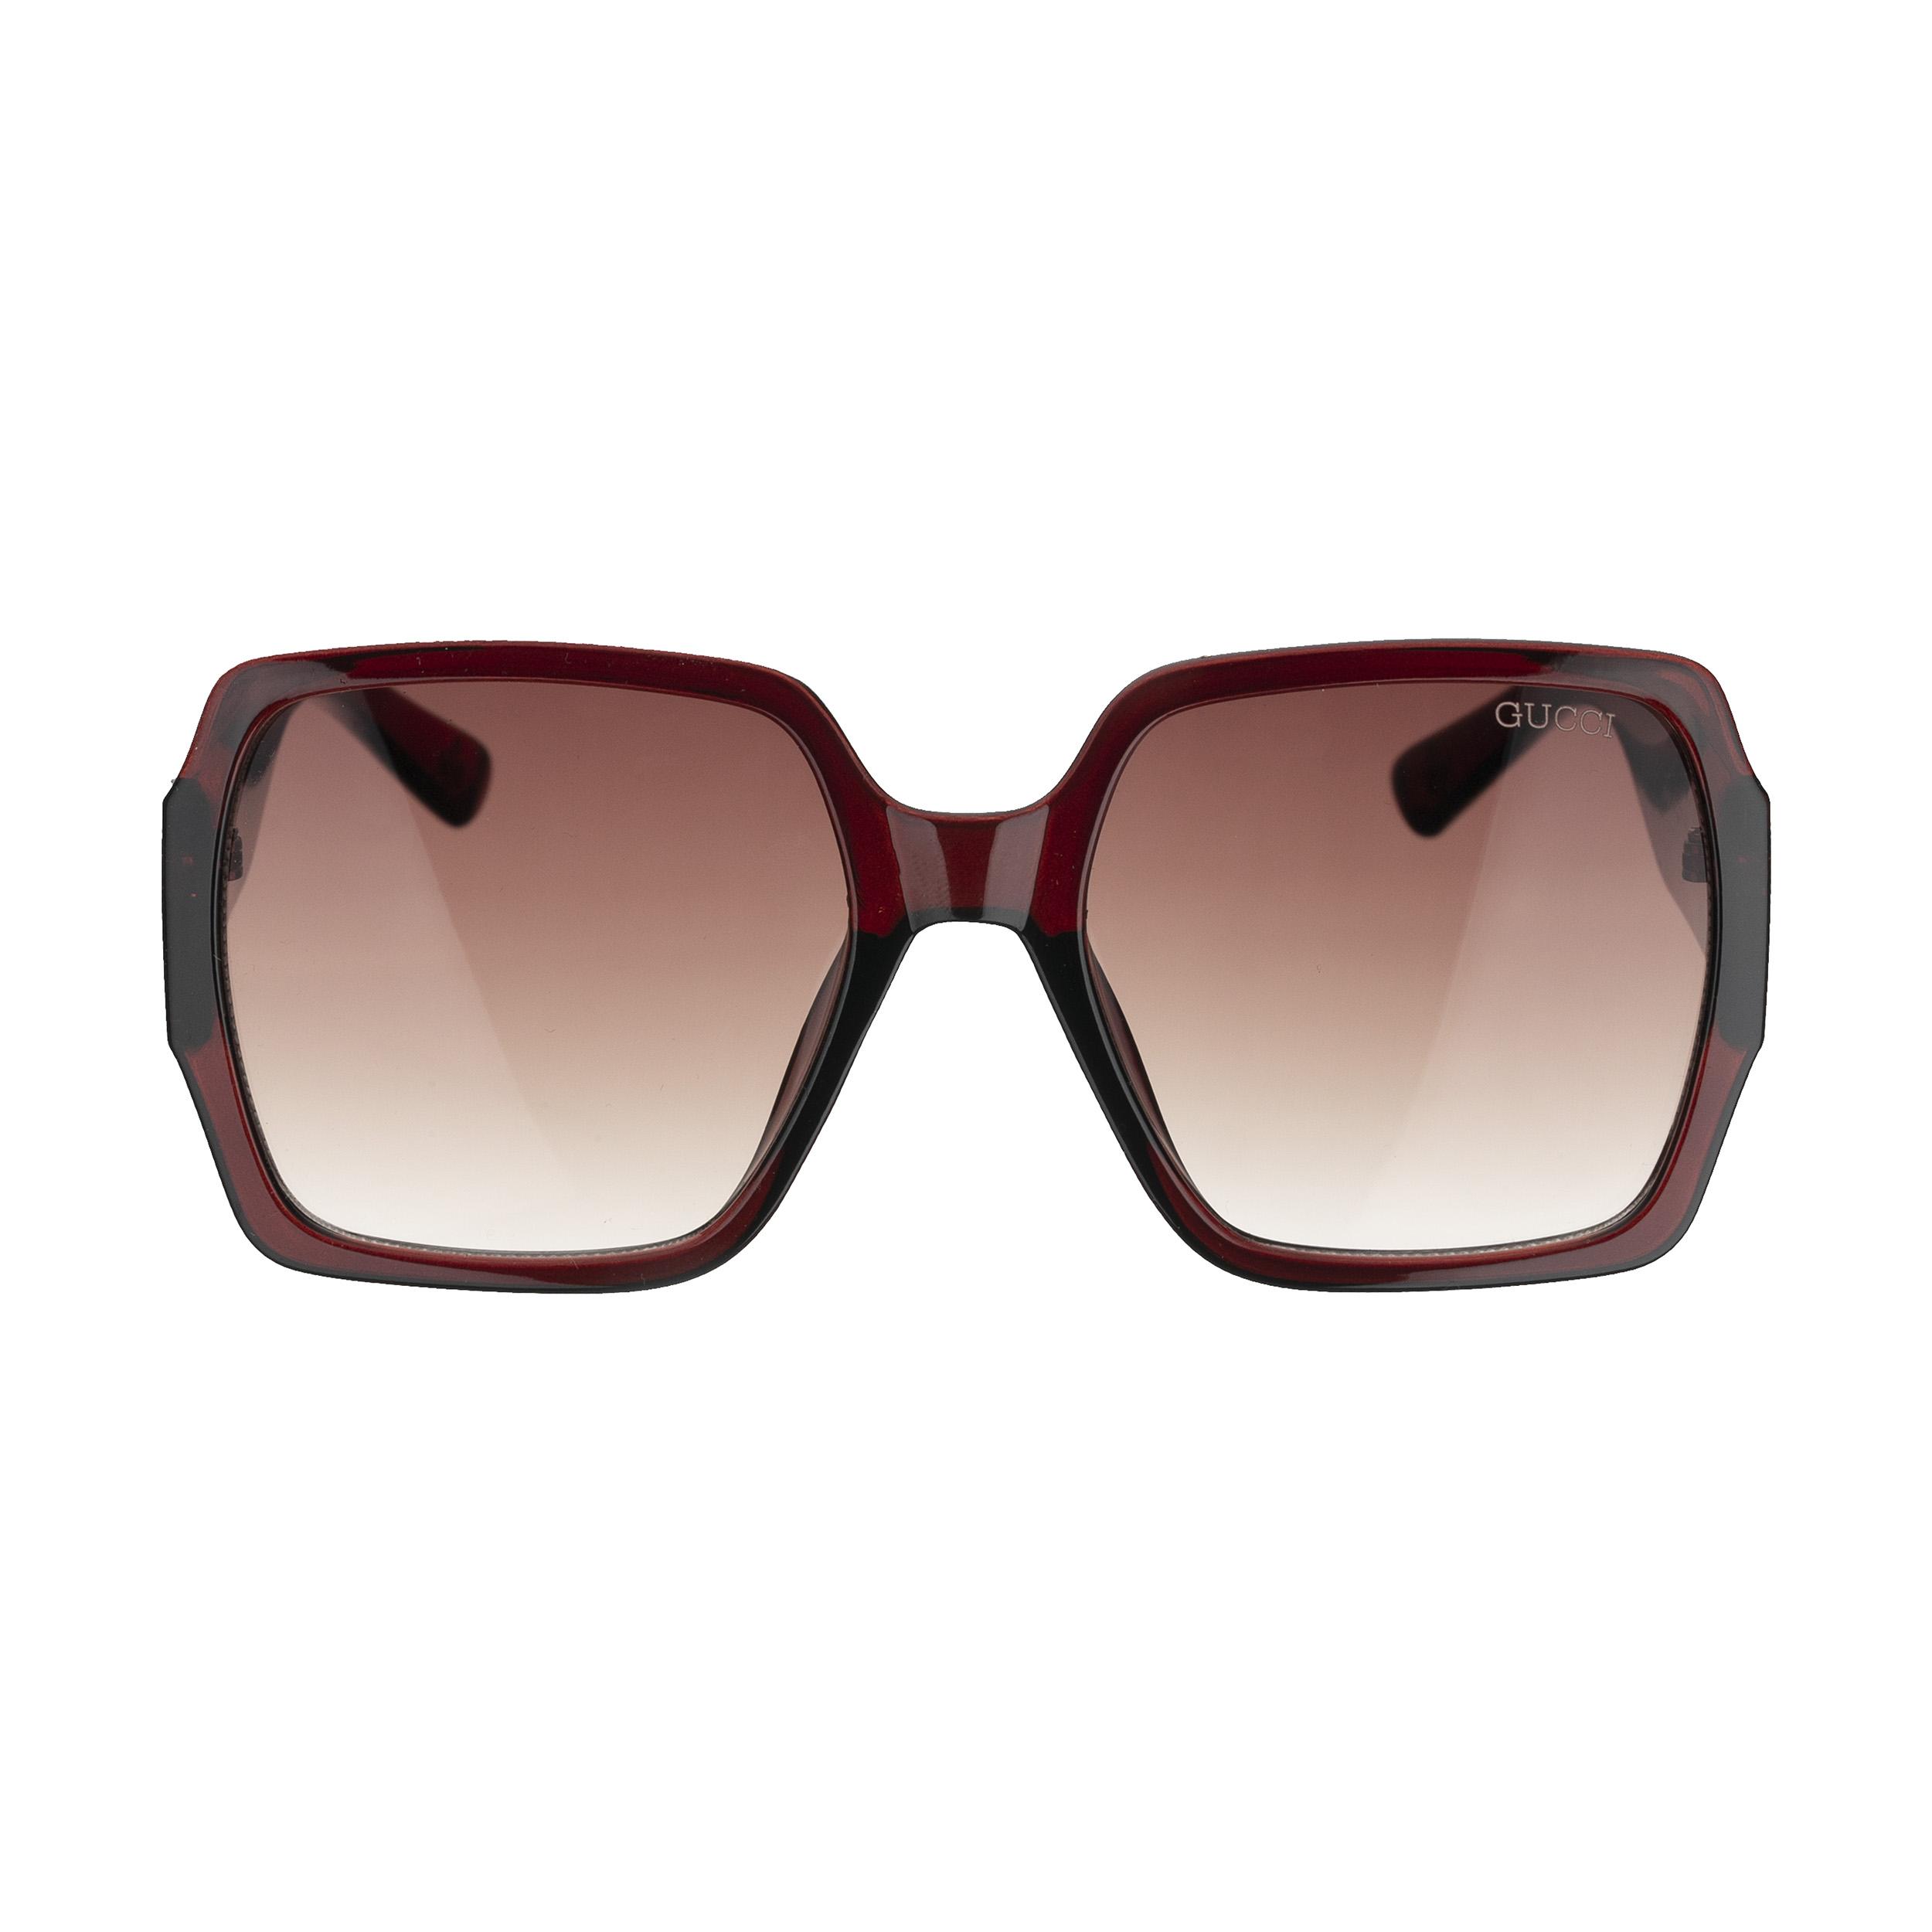 قیمت عینک آفتابی زنانه مدل 8404 Transparent Russet